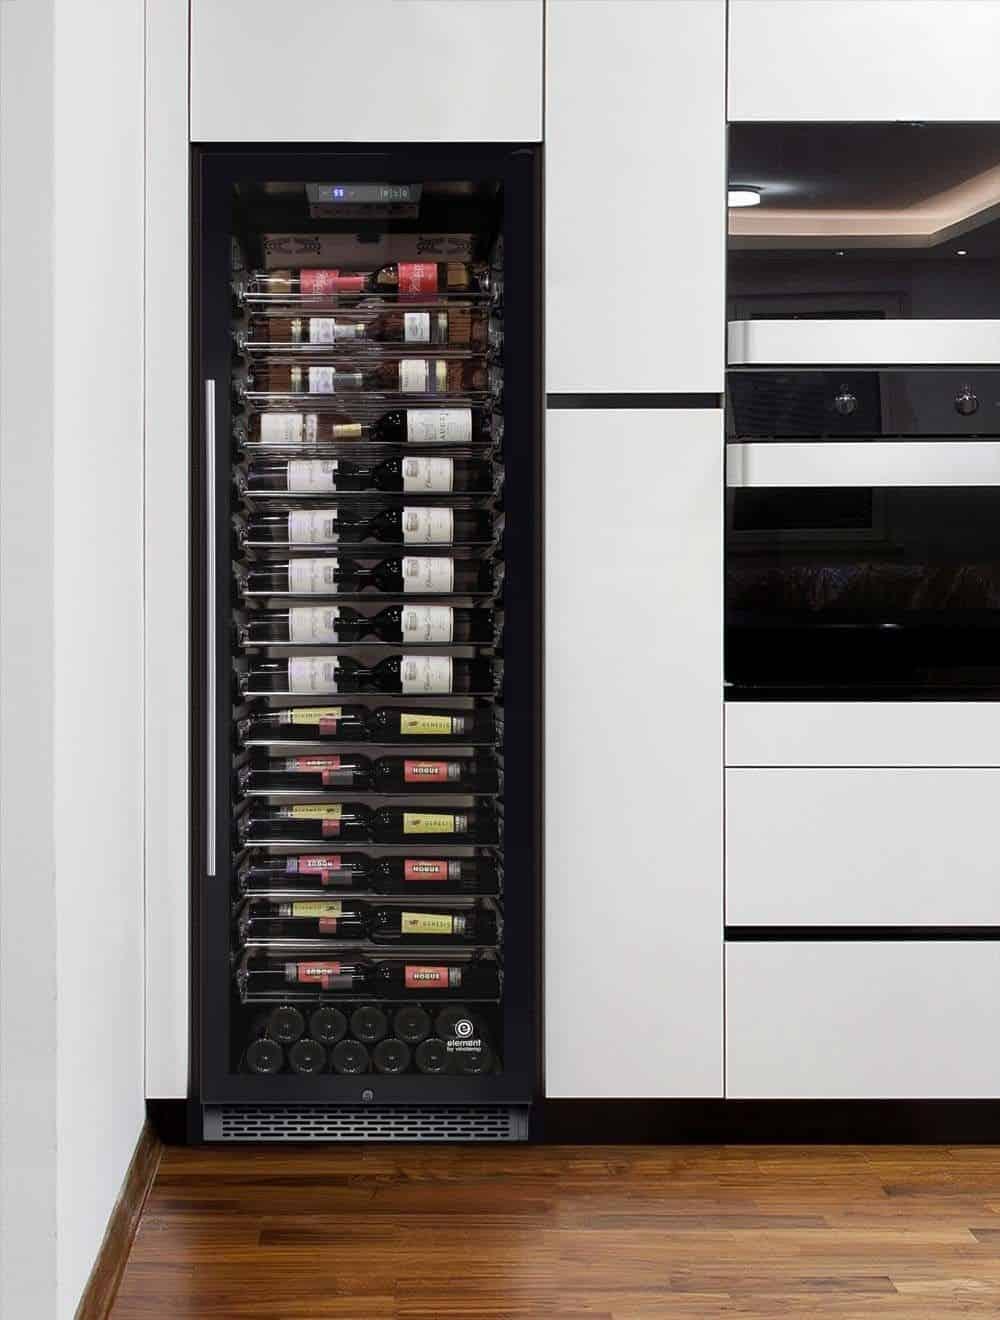 VinoTemp 141 Single Zone Freestanding Built-In Wine Cellar